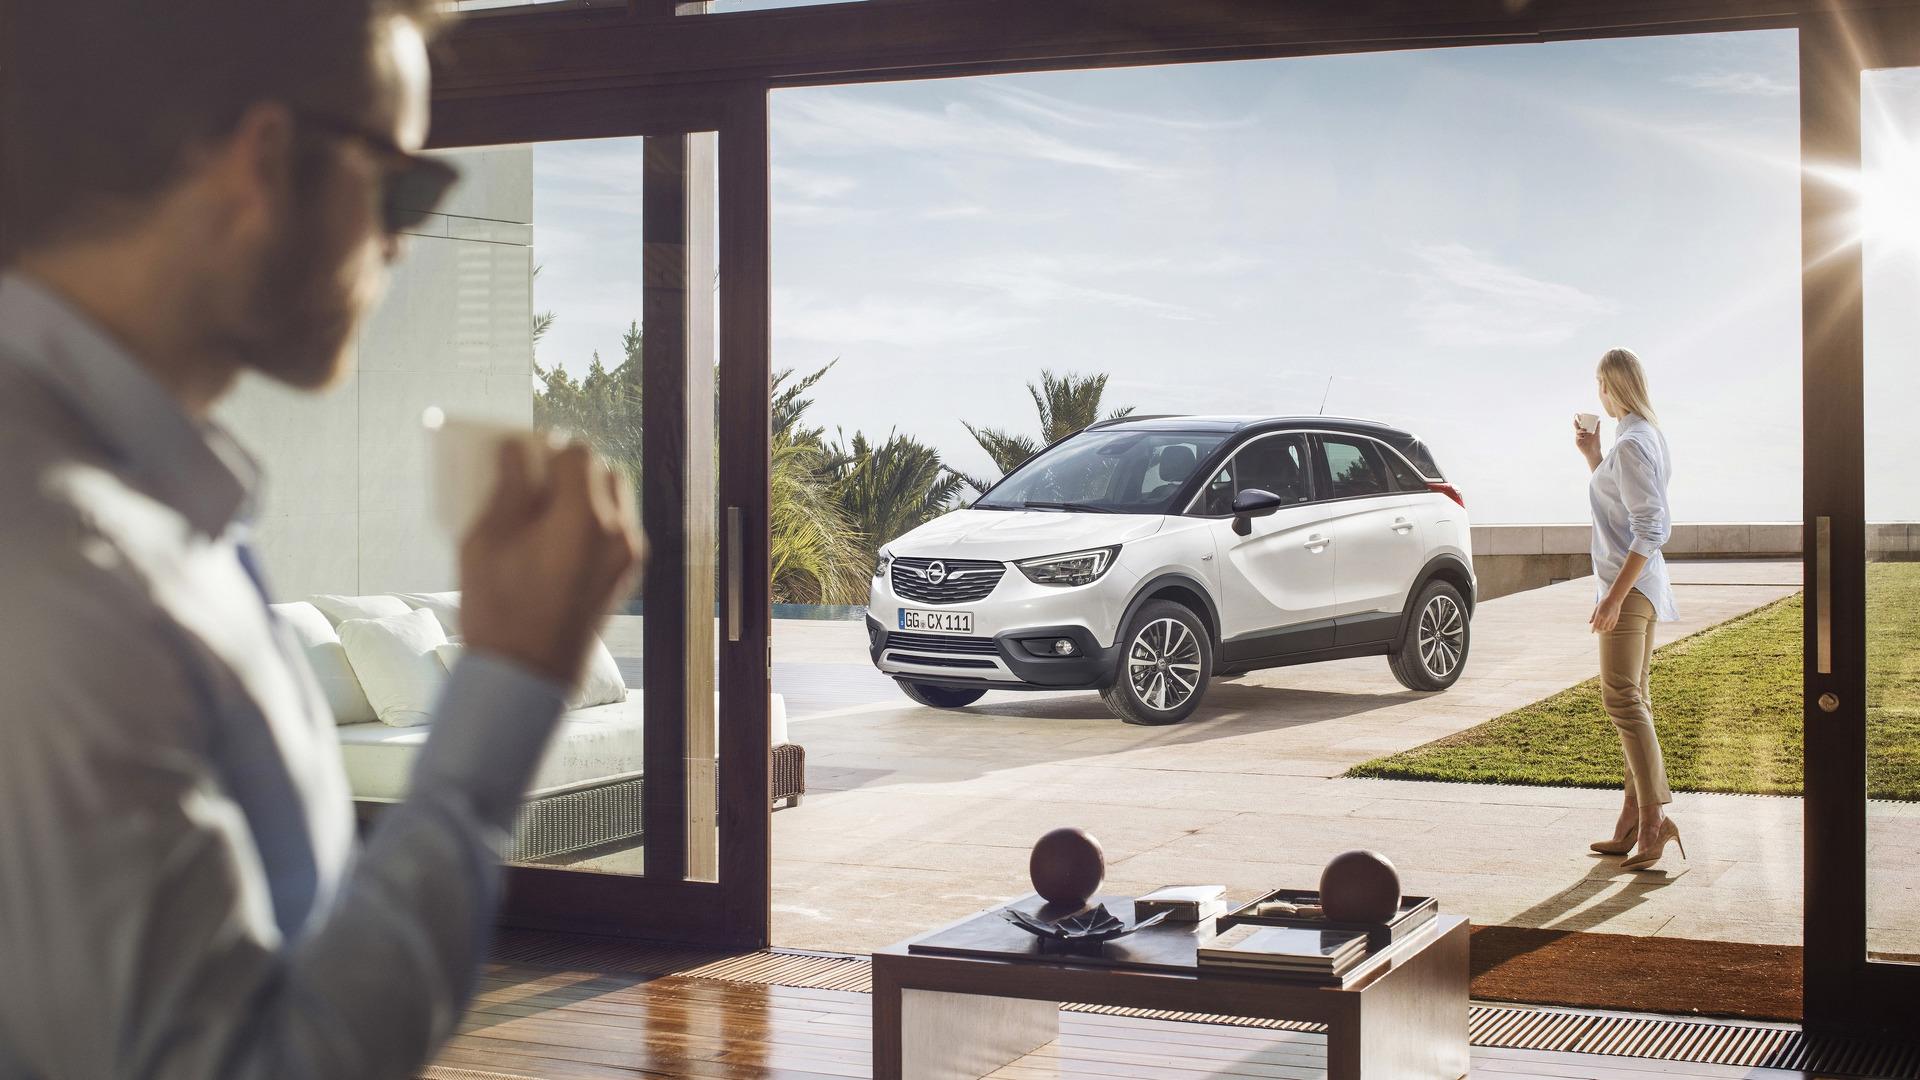 The new Opel Crossland X